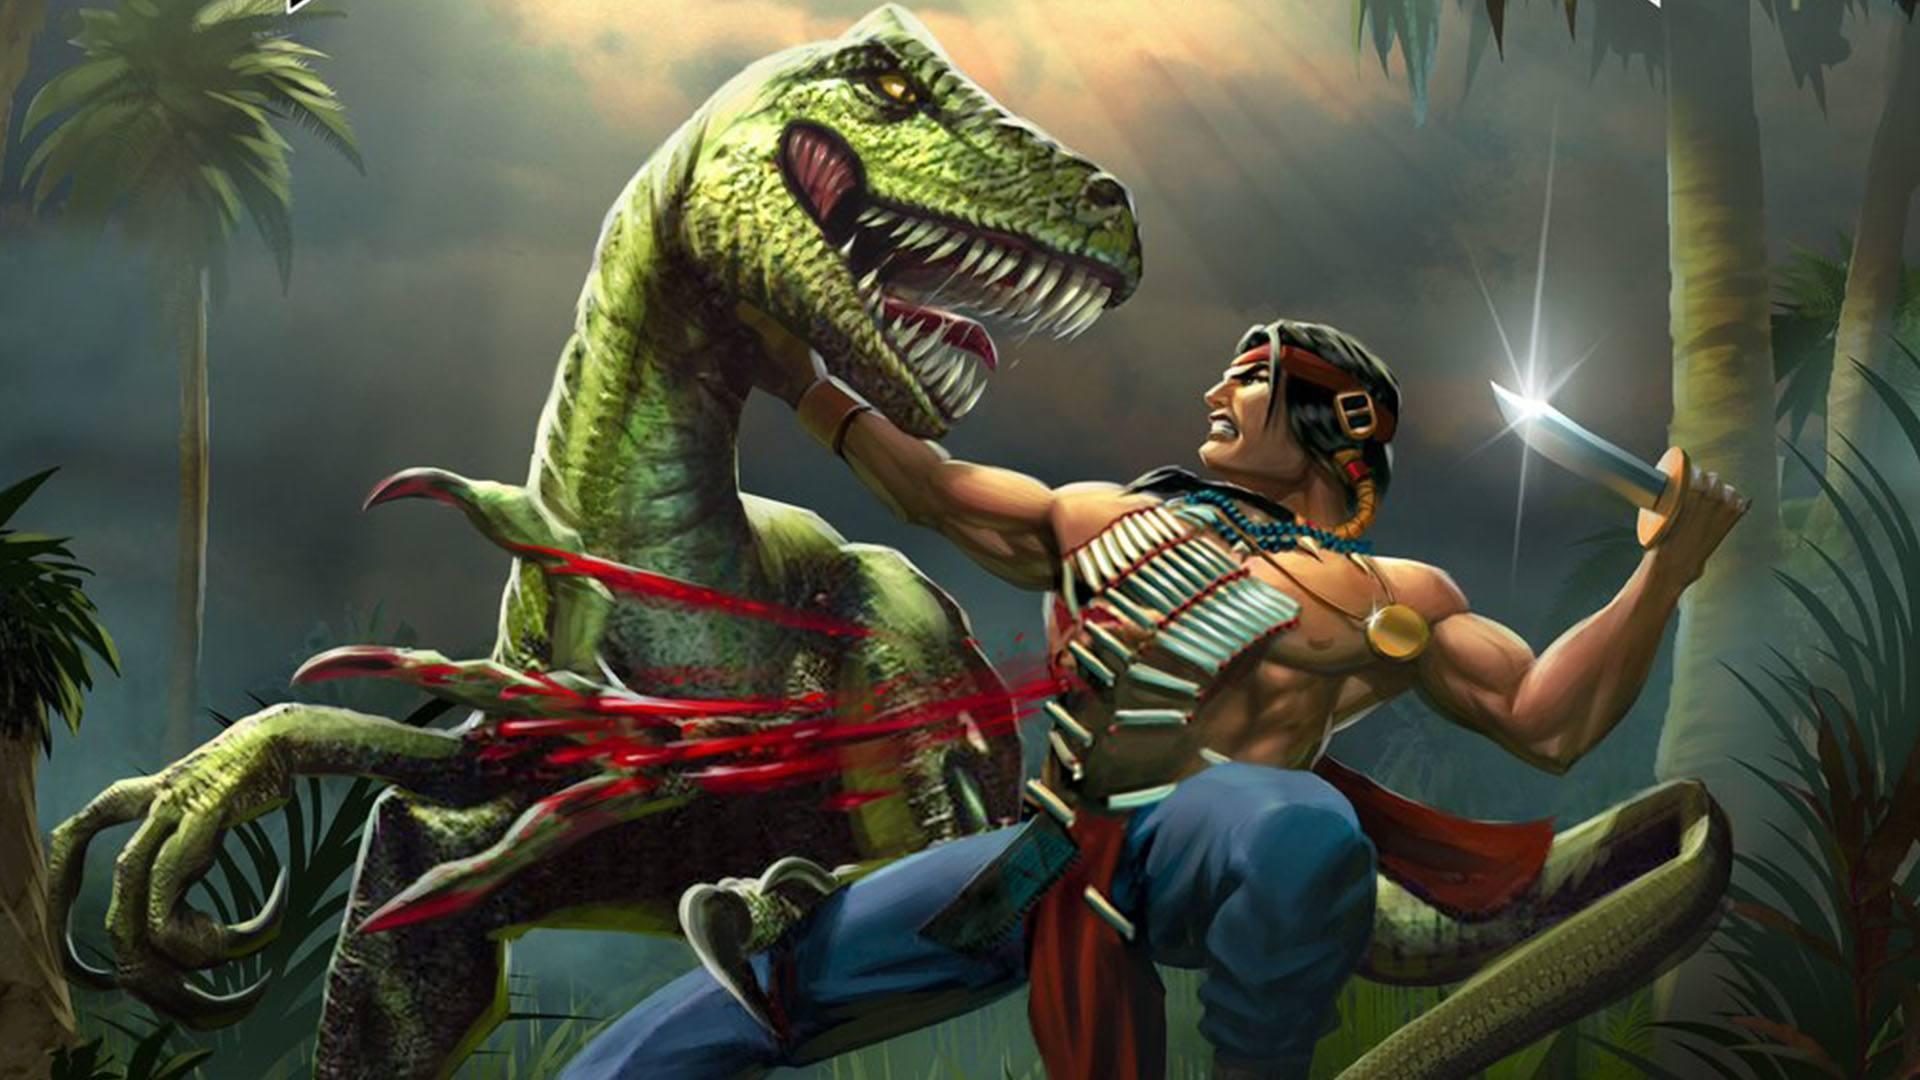 REVIEW / Turok: Dinosaur Hunter (PC) - That VideoGame Blog